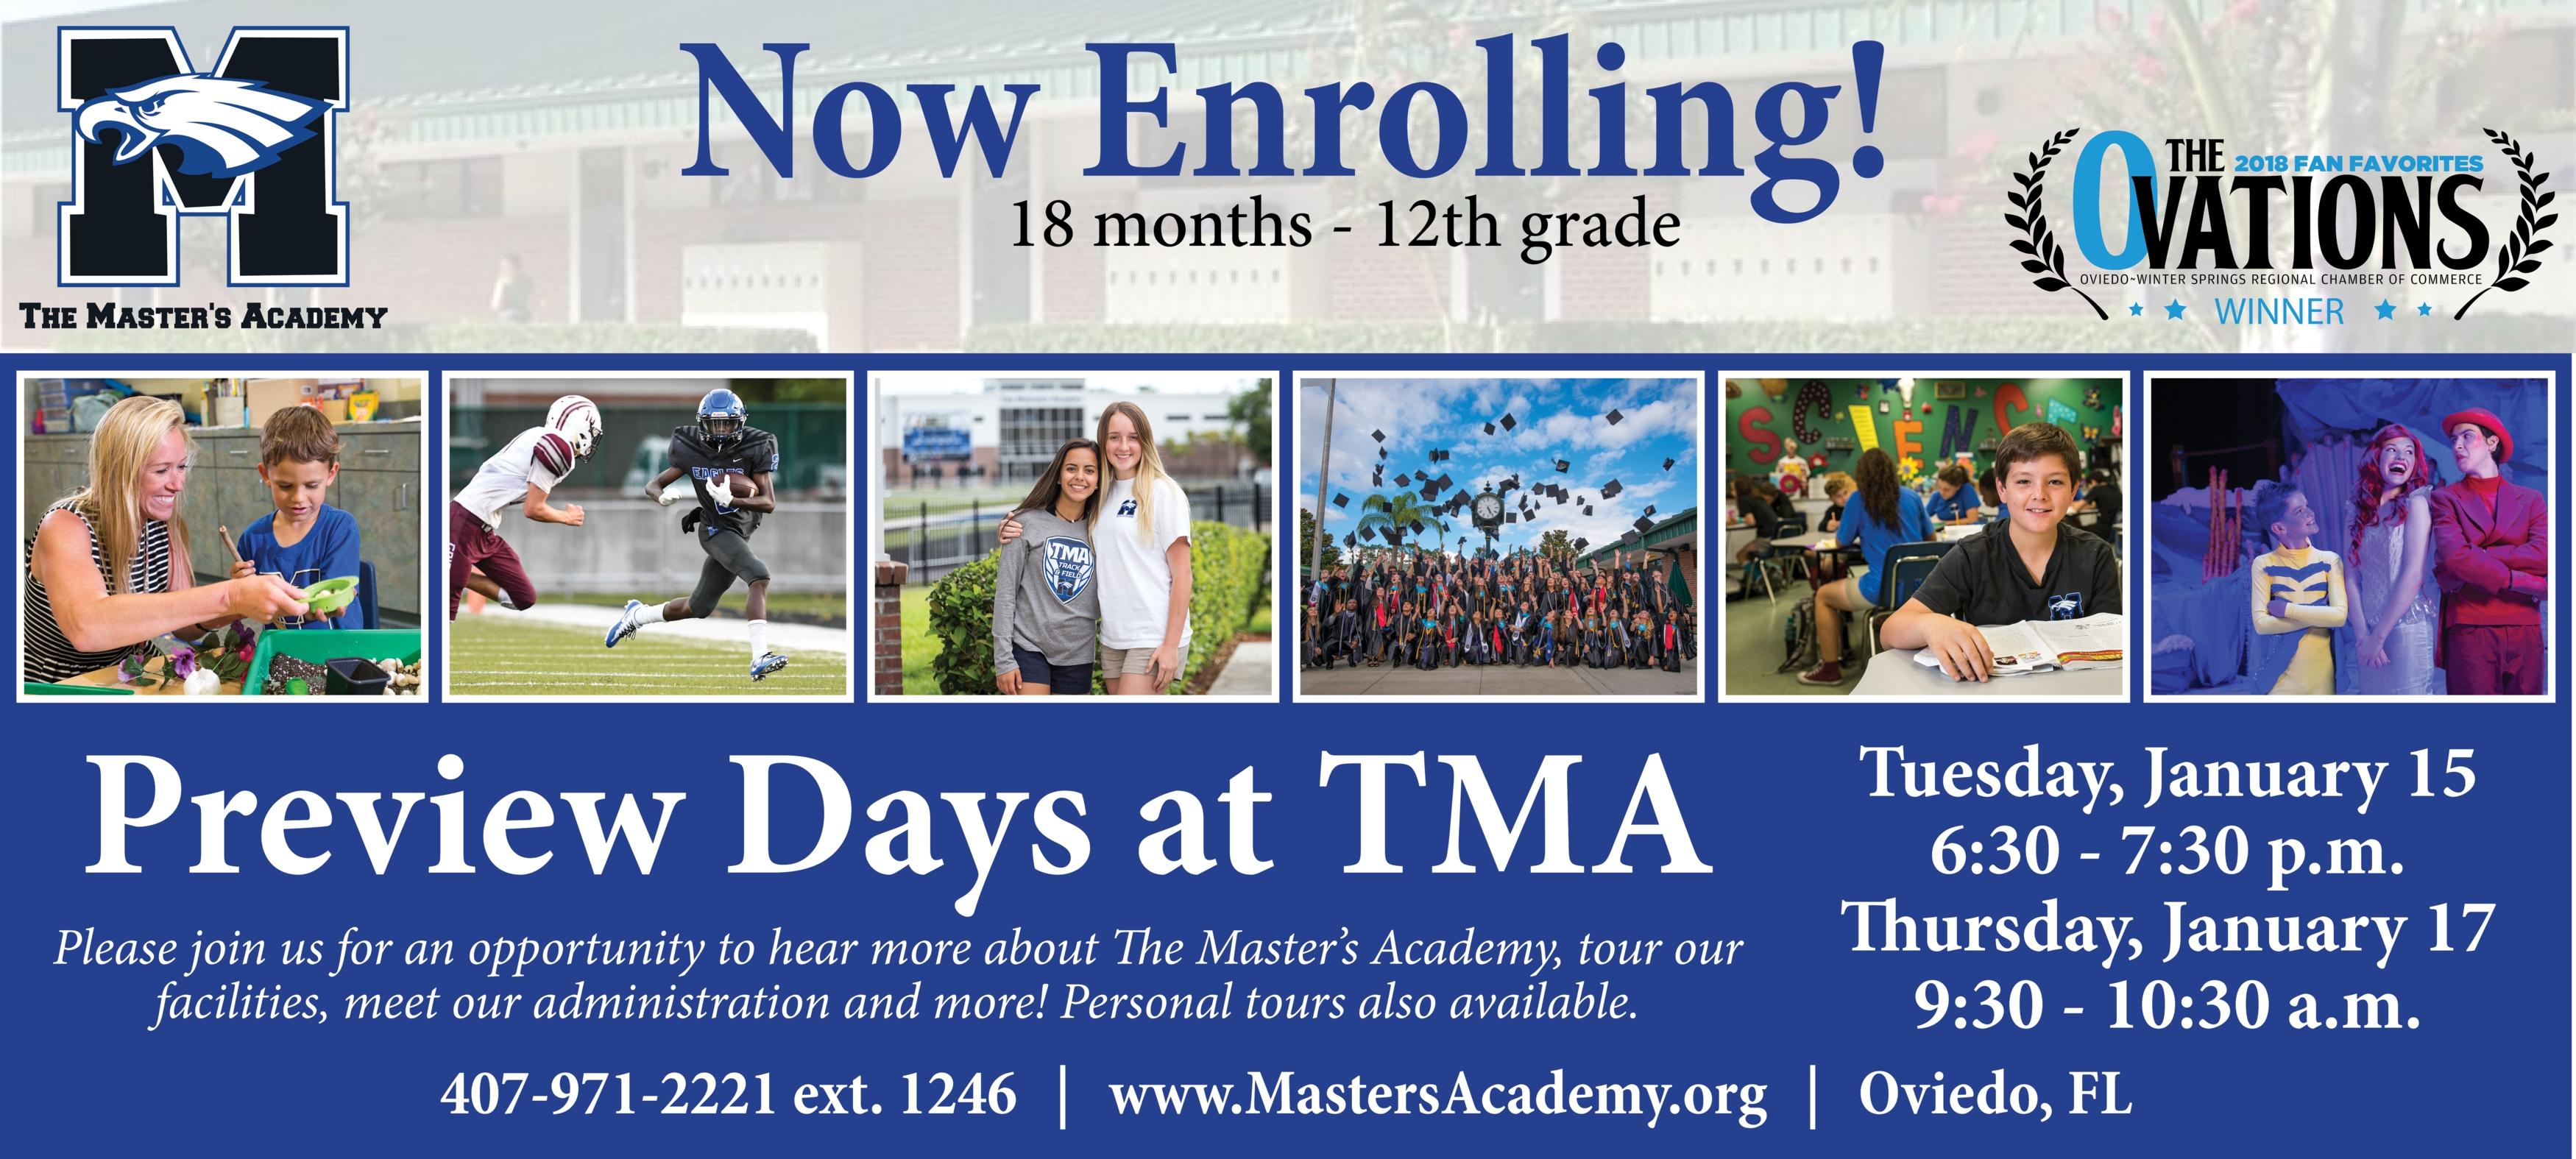 The Masters Academy Christian Education Orlando Florida